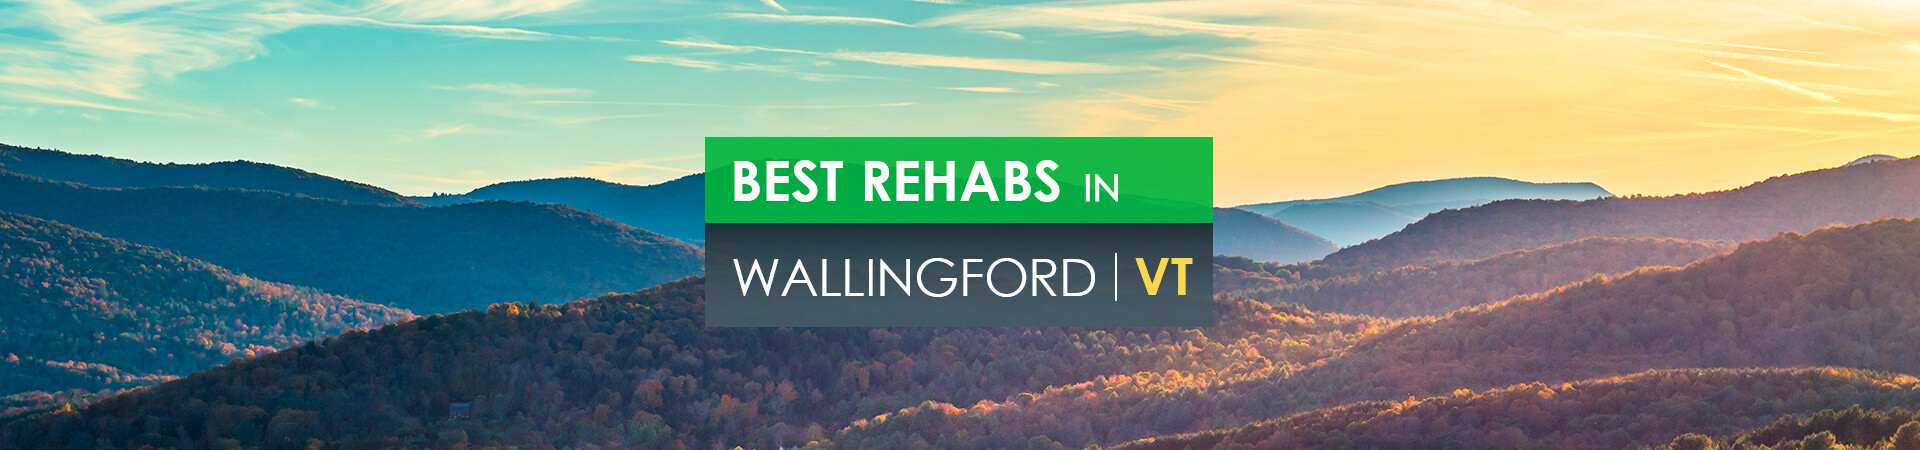 Best rehabs in Wallingford, VT